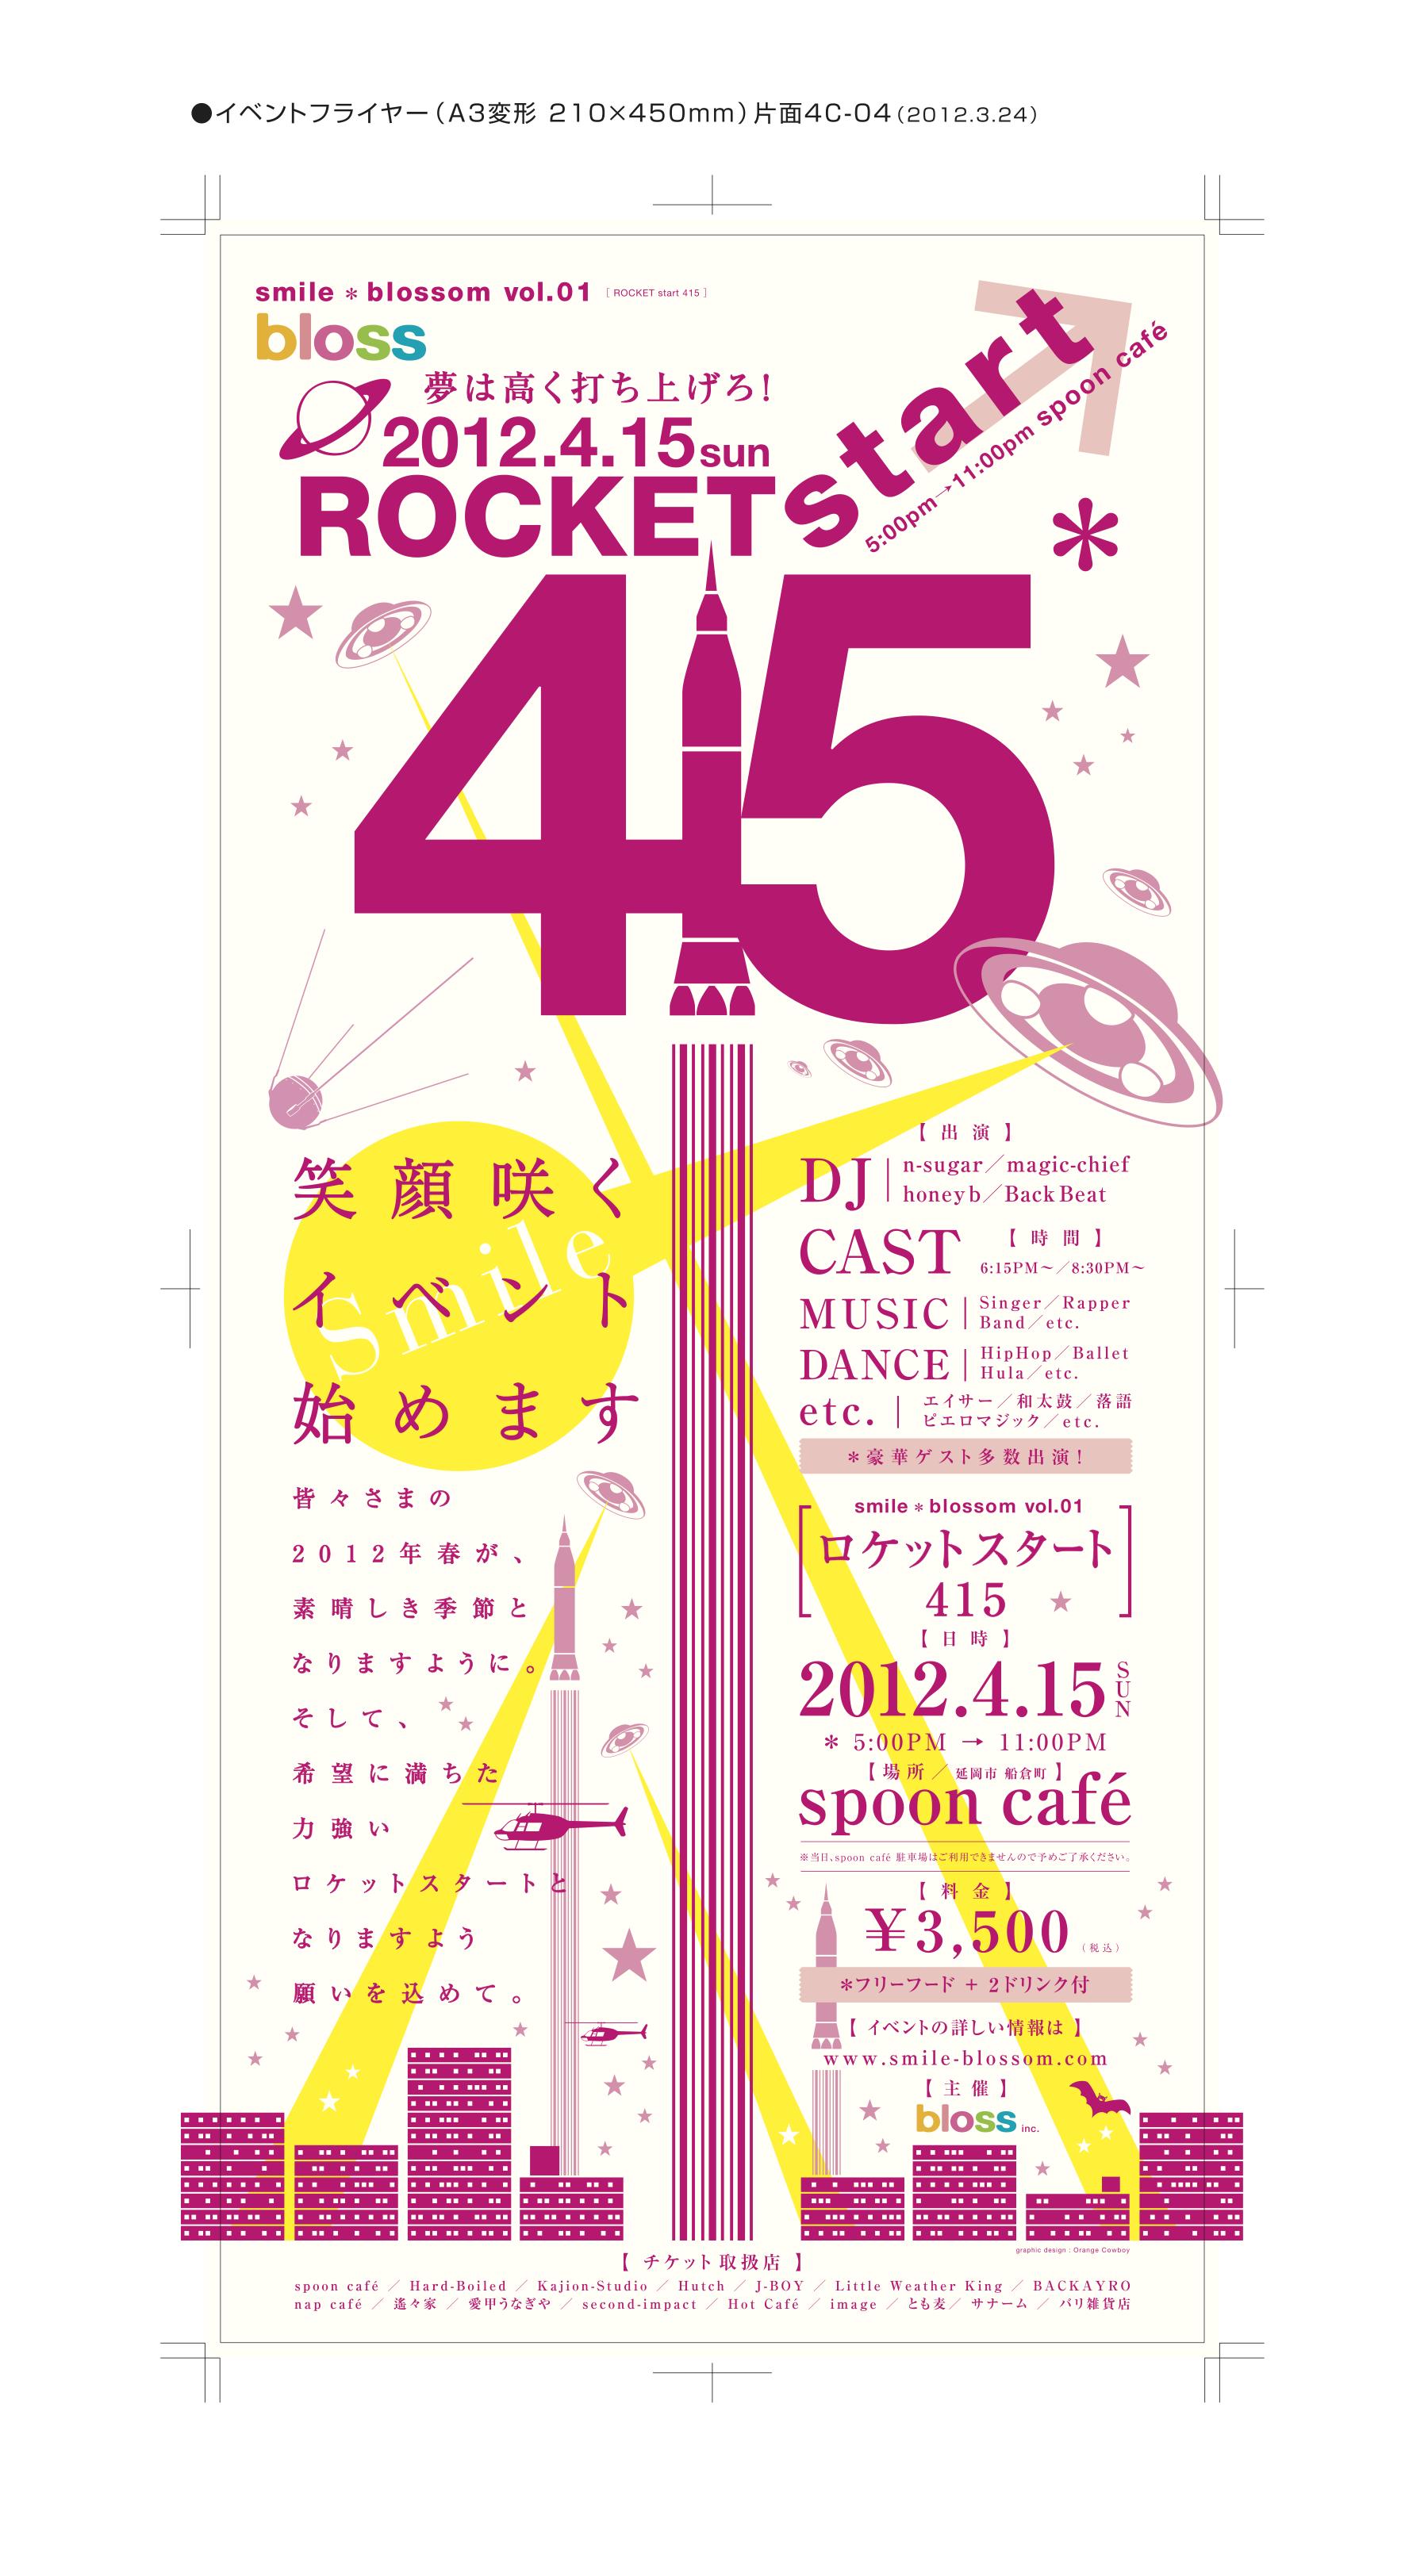 ROCKET start 415 ~タイムスケジュール~